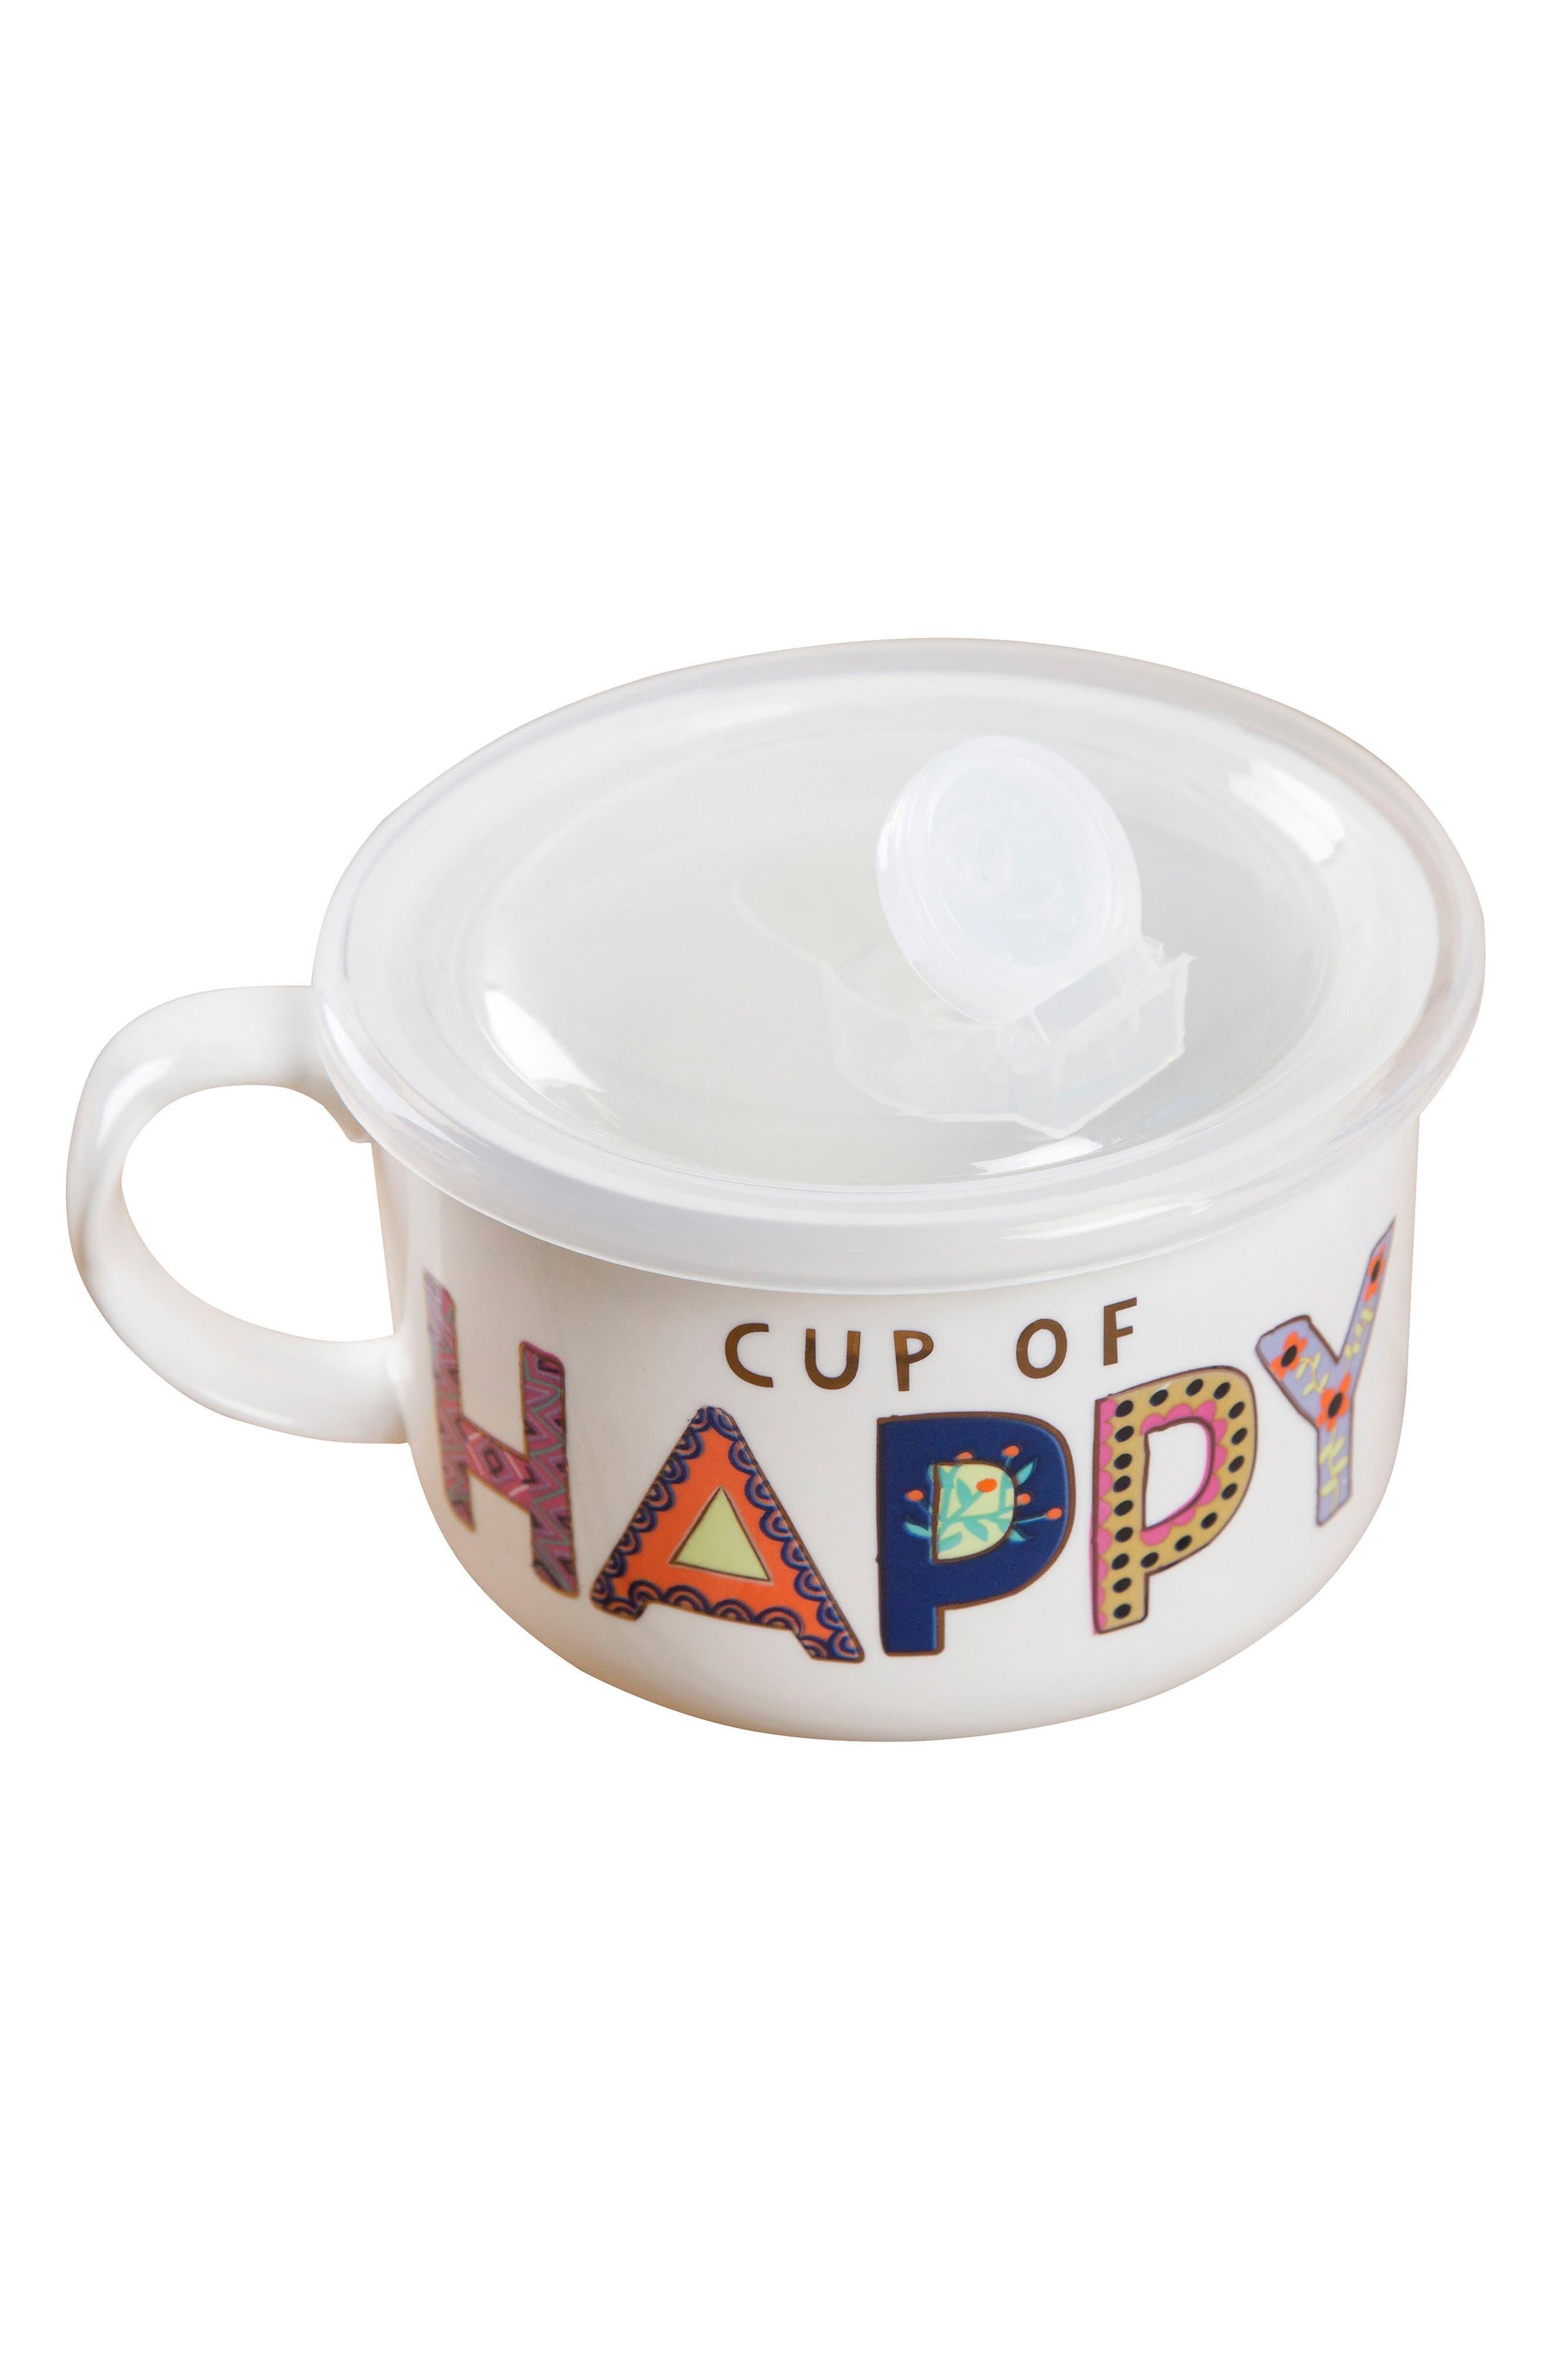 Natural Life Cup of Happy Lidded Ceramic Soup Mug